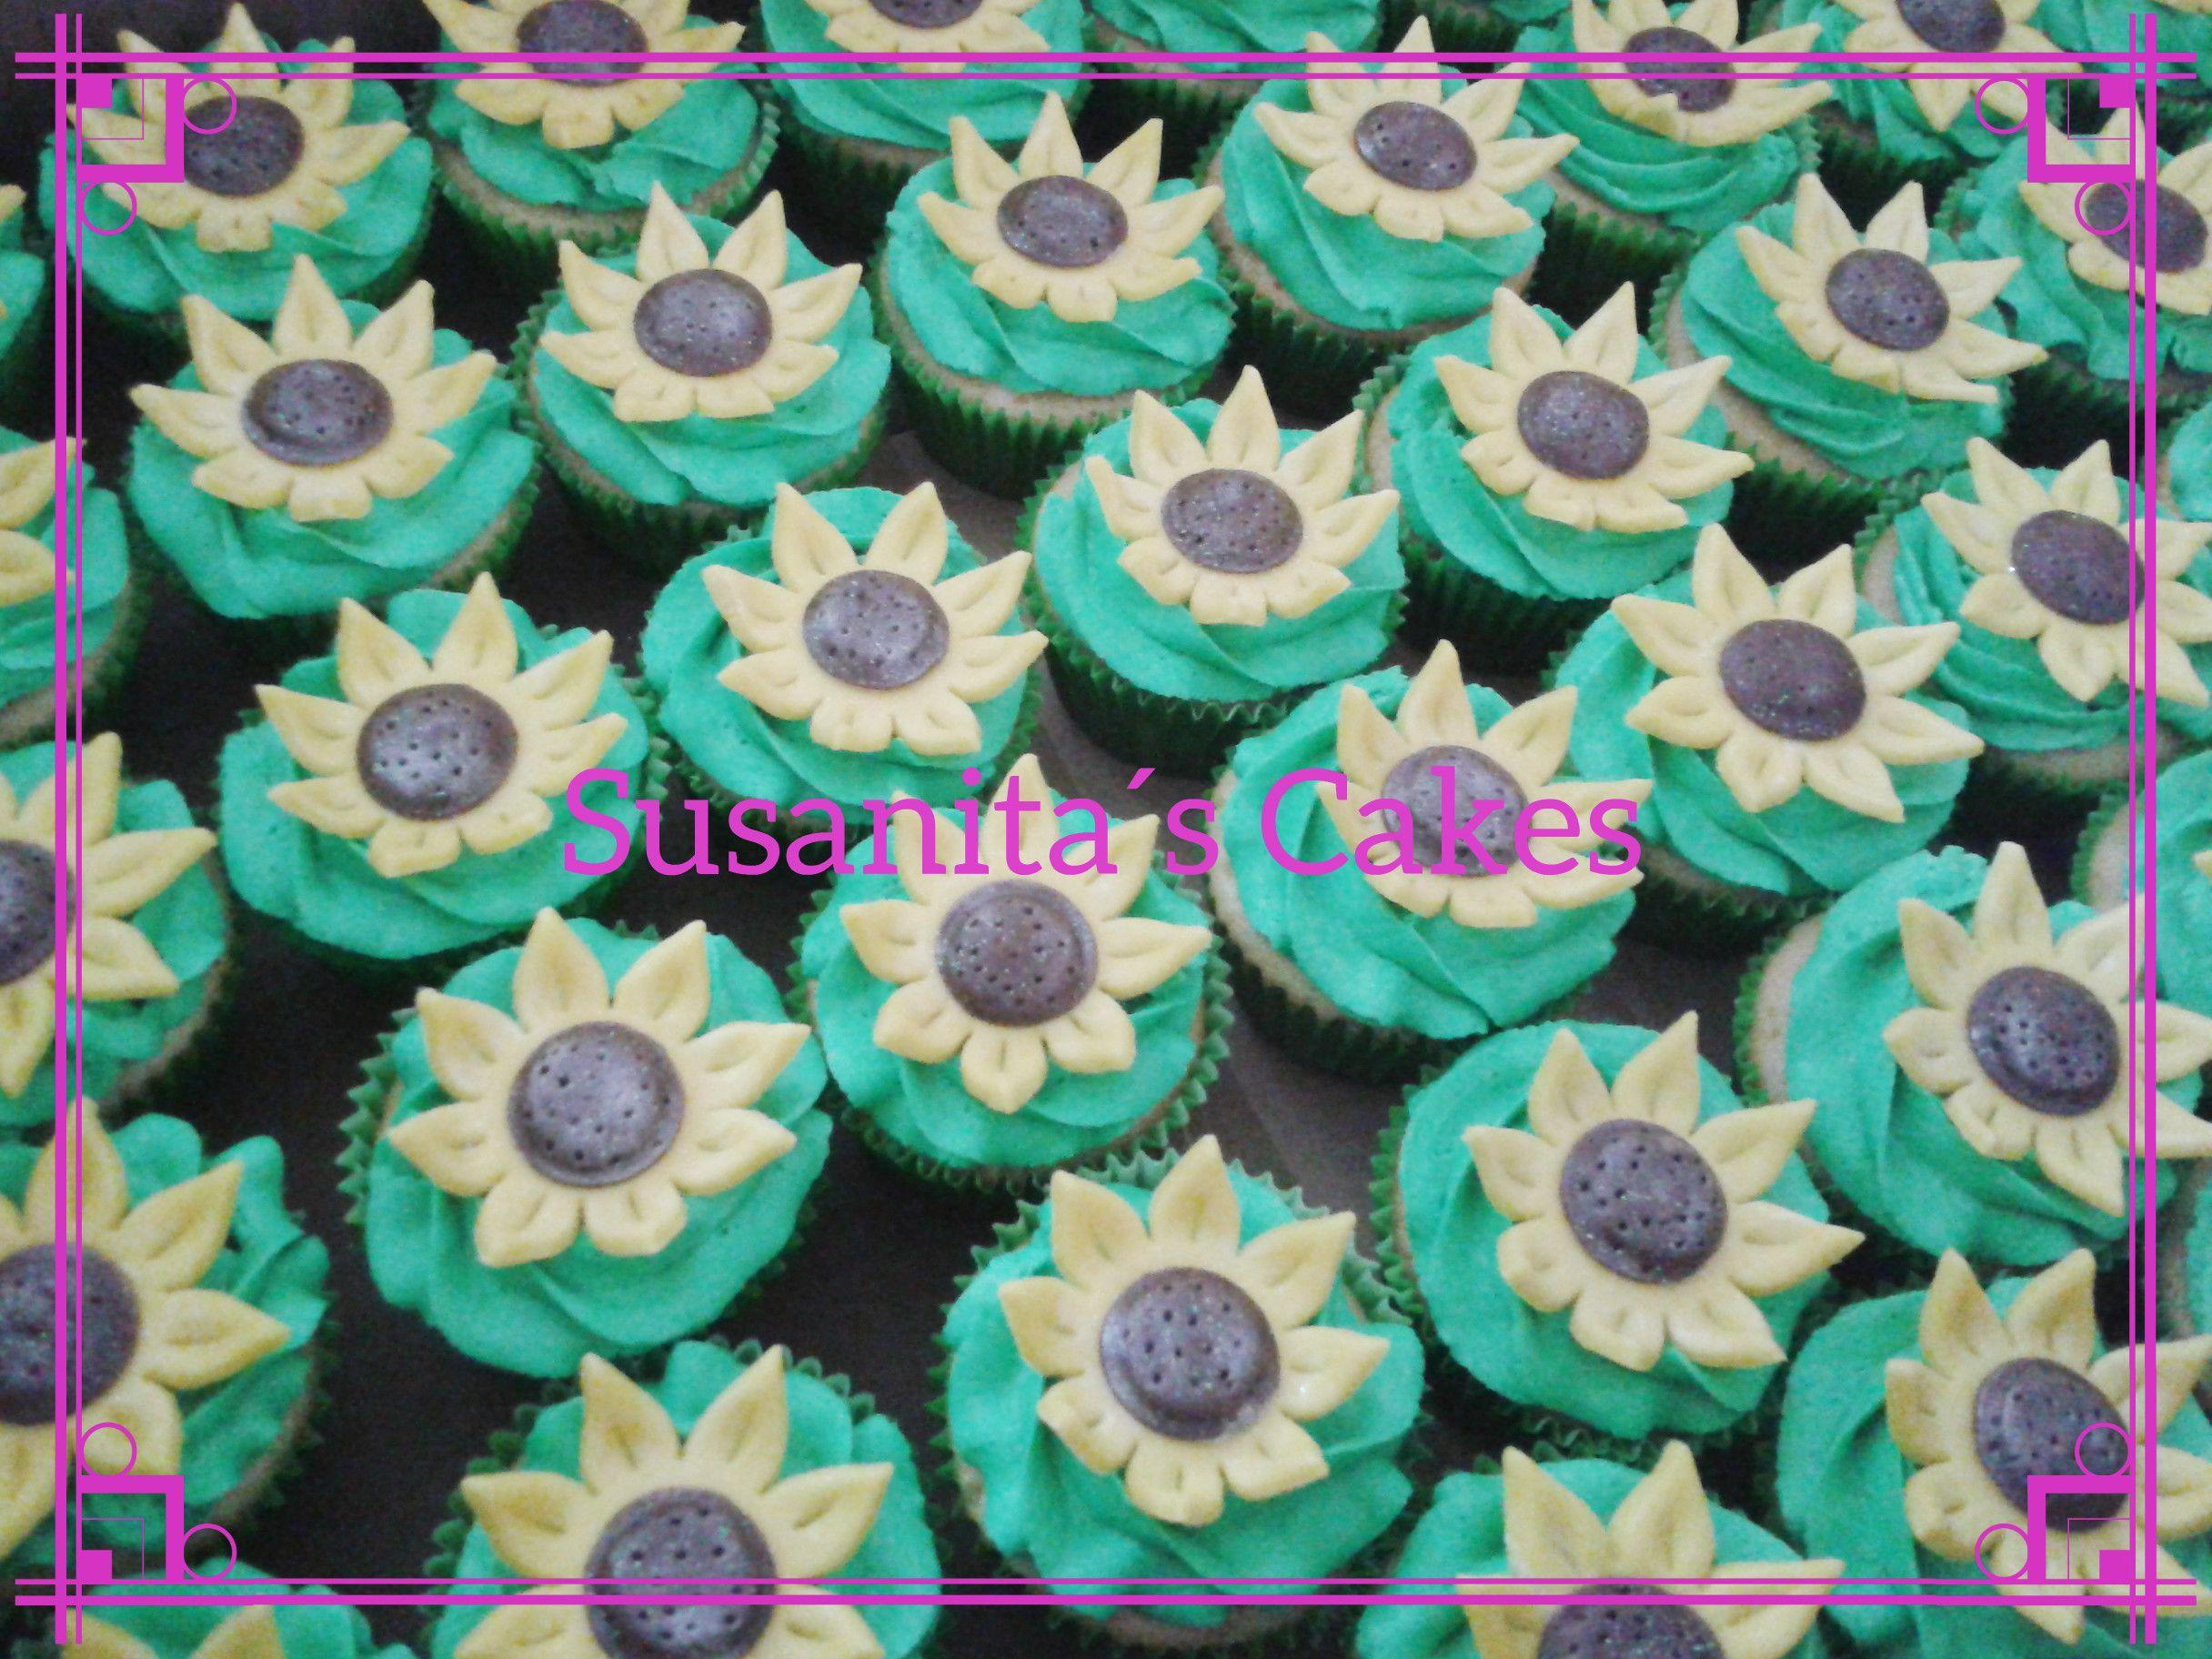 Cupcakes de Girasoles!....para una fiesta con tema Frozen Fever! #frozen #frozenfever #cupcakes #ponquesitos #talentovenezolano #susanitascakes